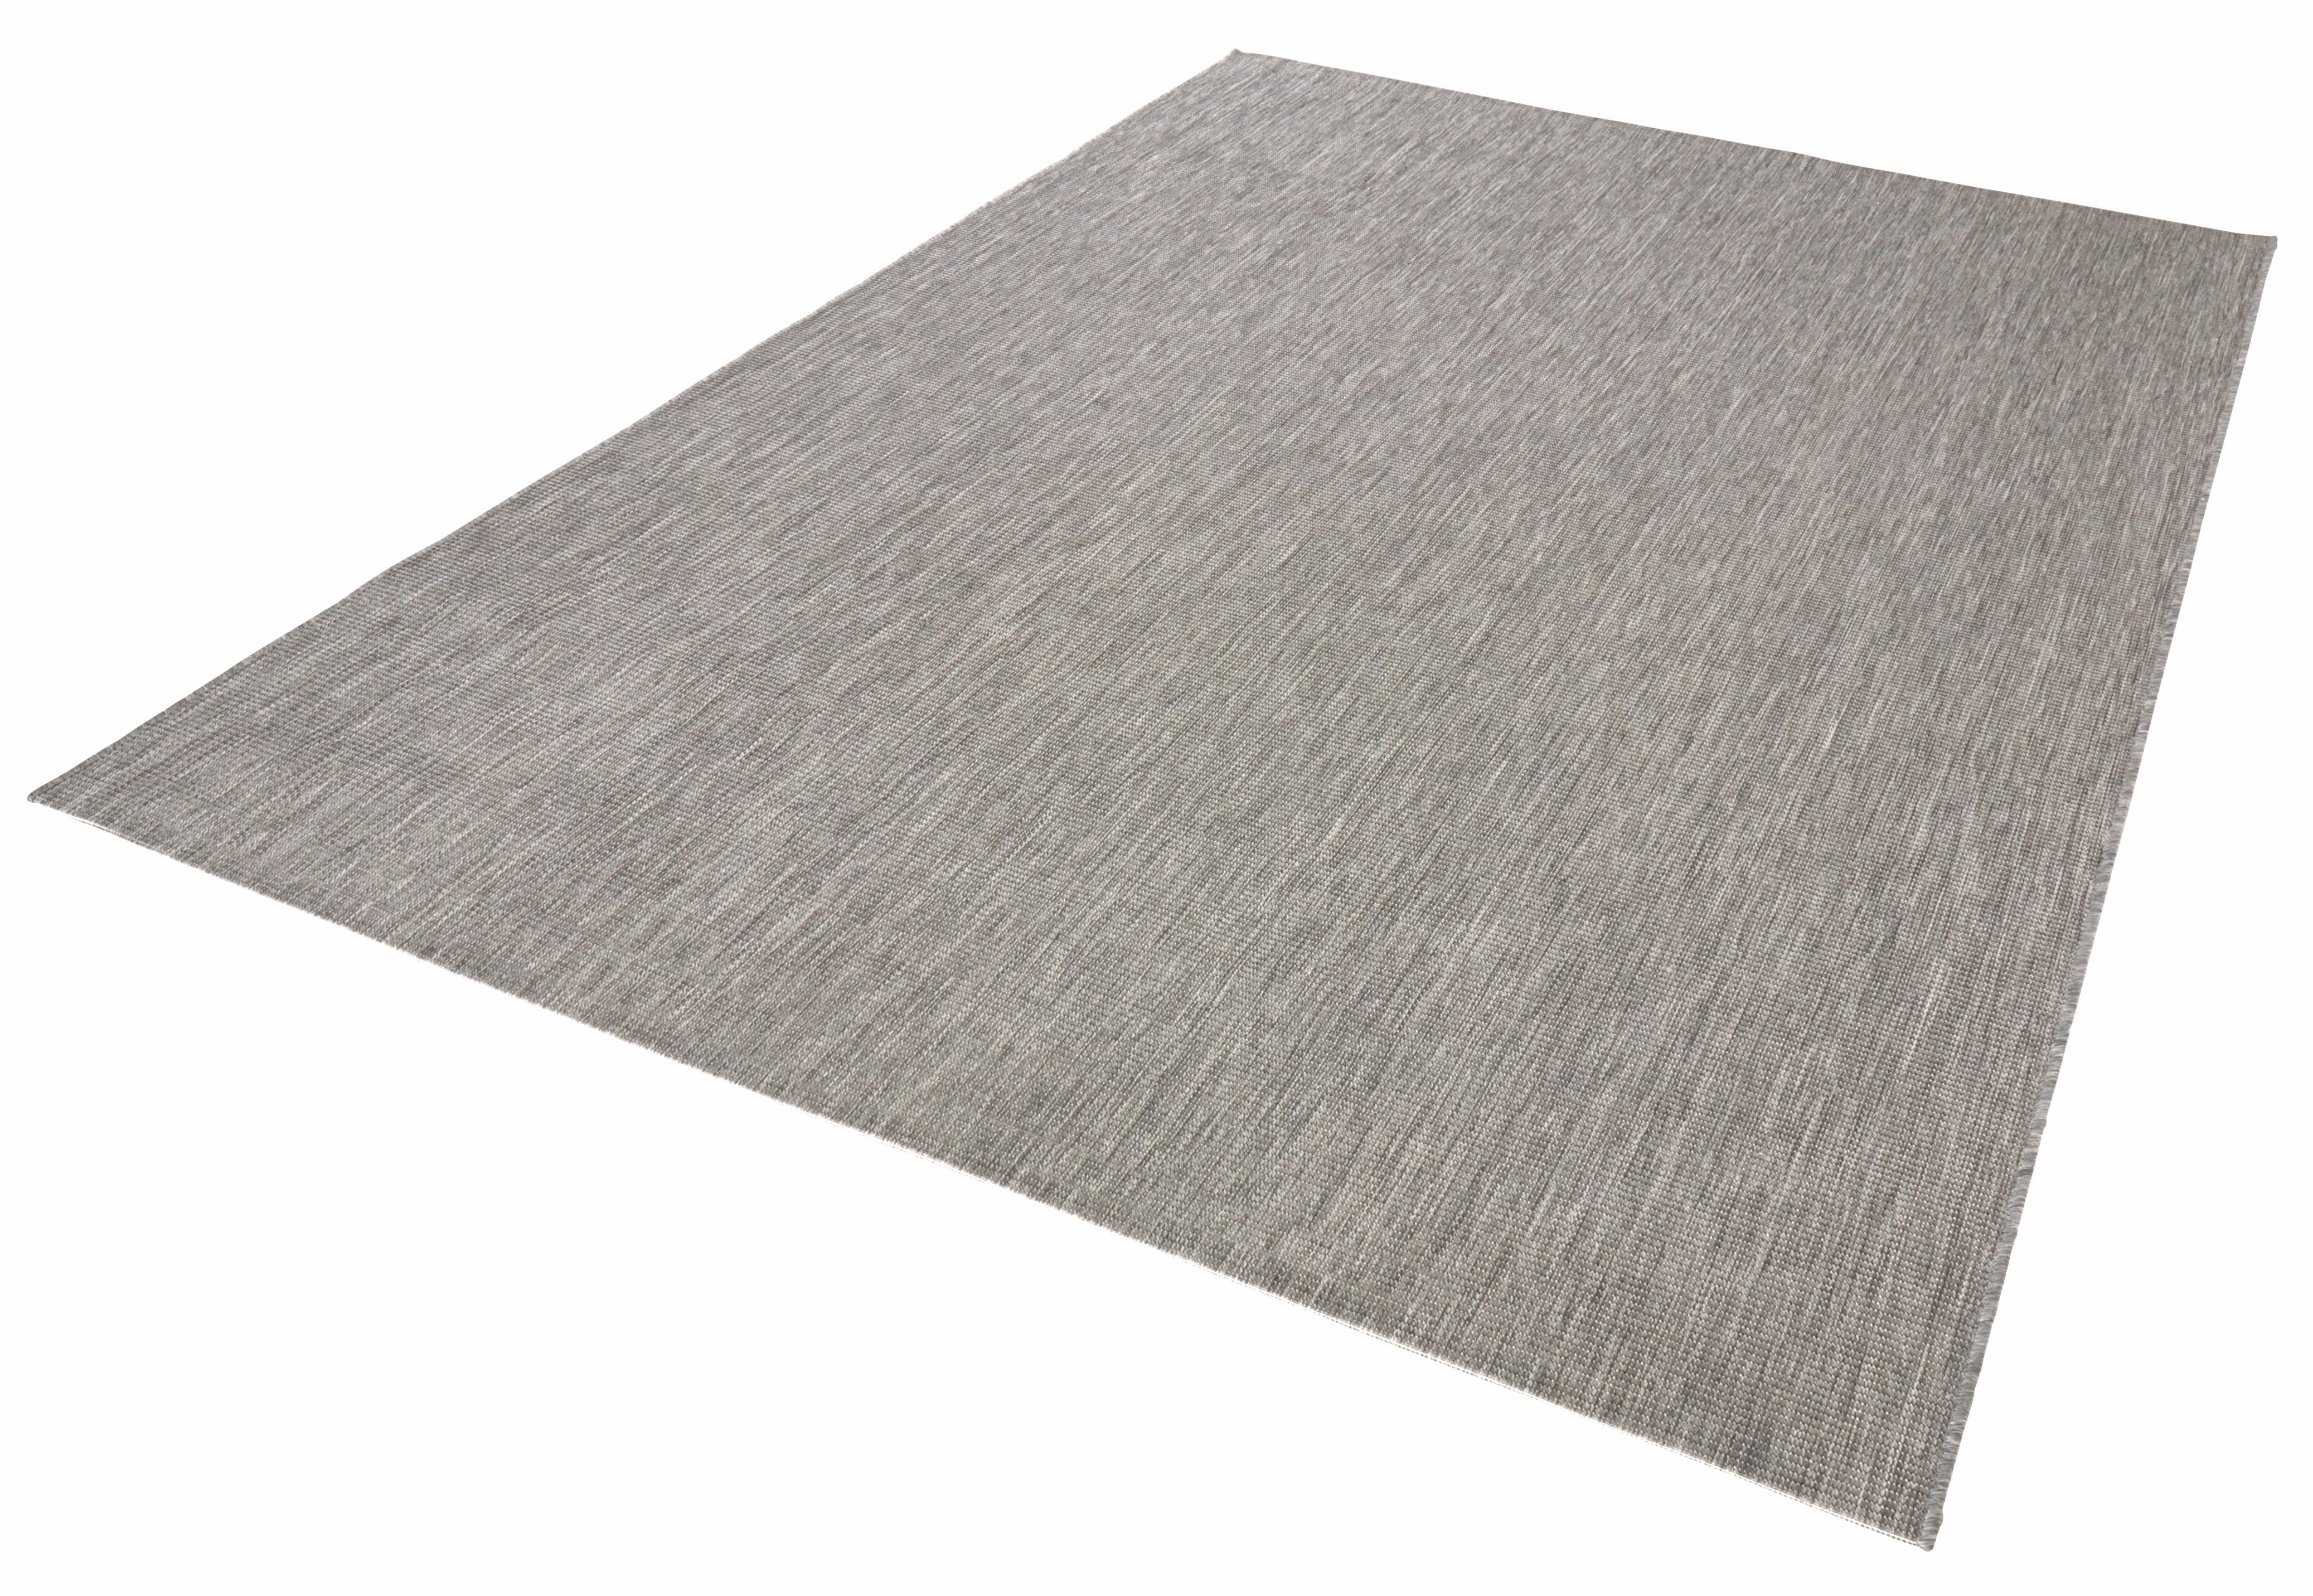 Teppich Match bougari rechteckig Höhe 8 mm